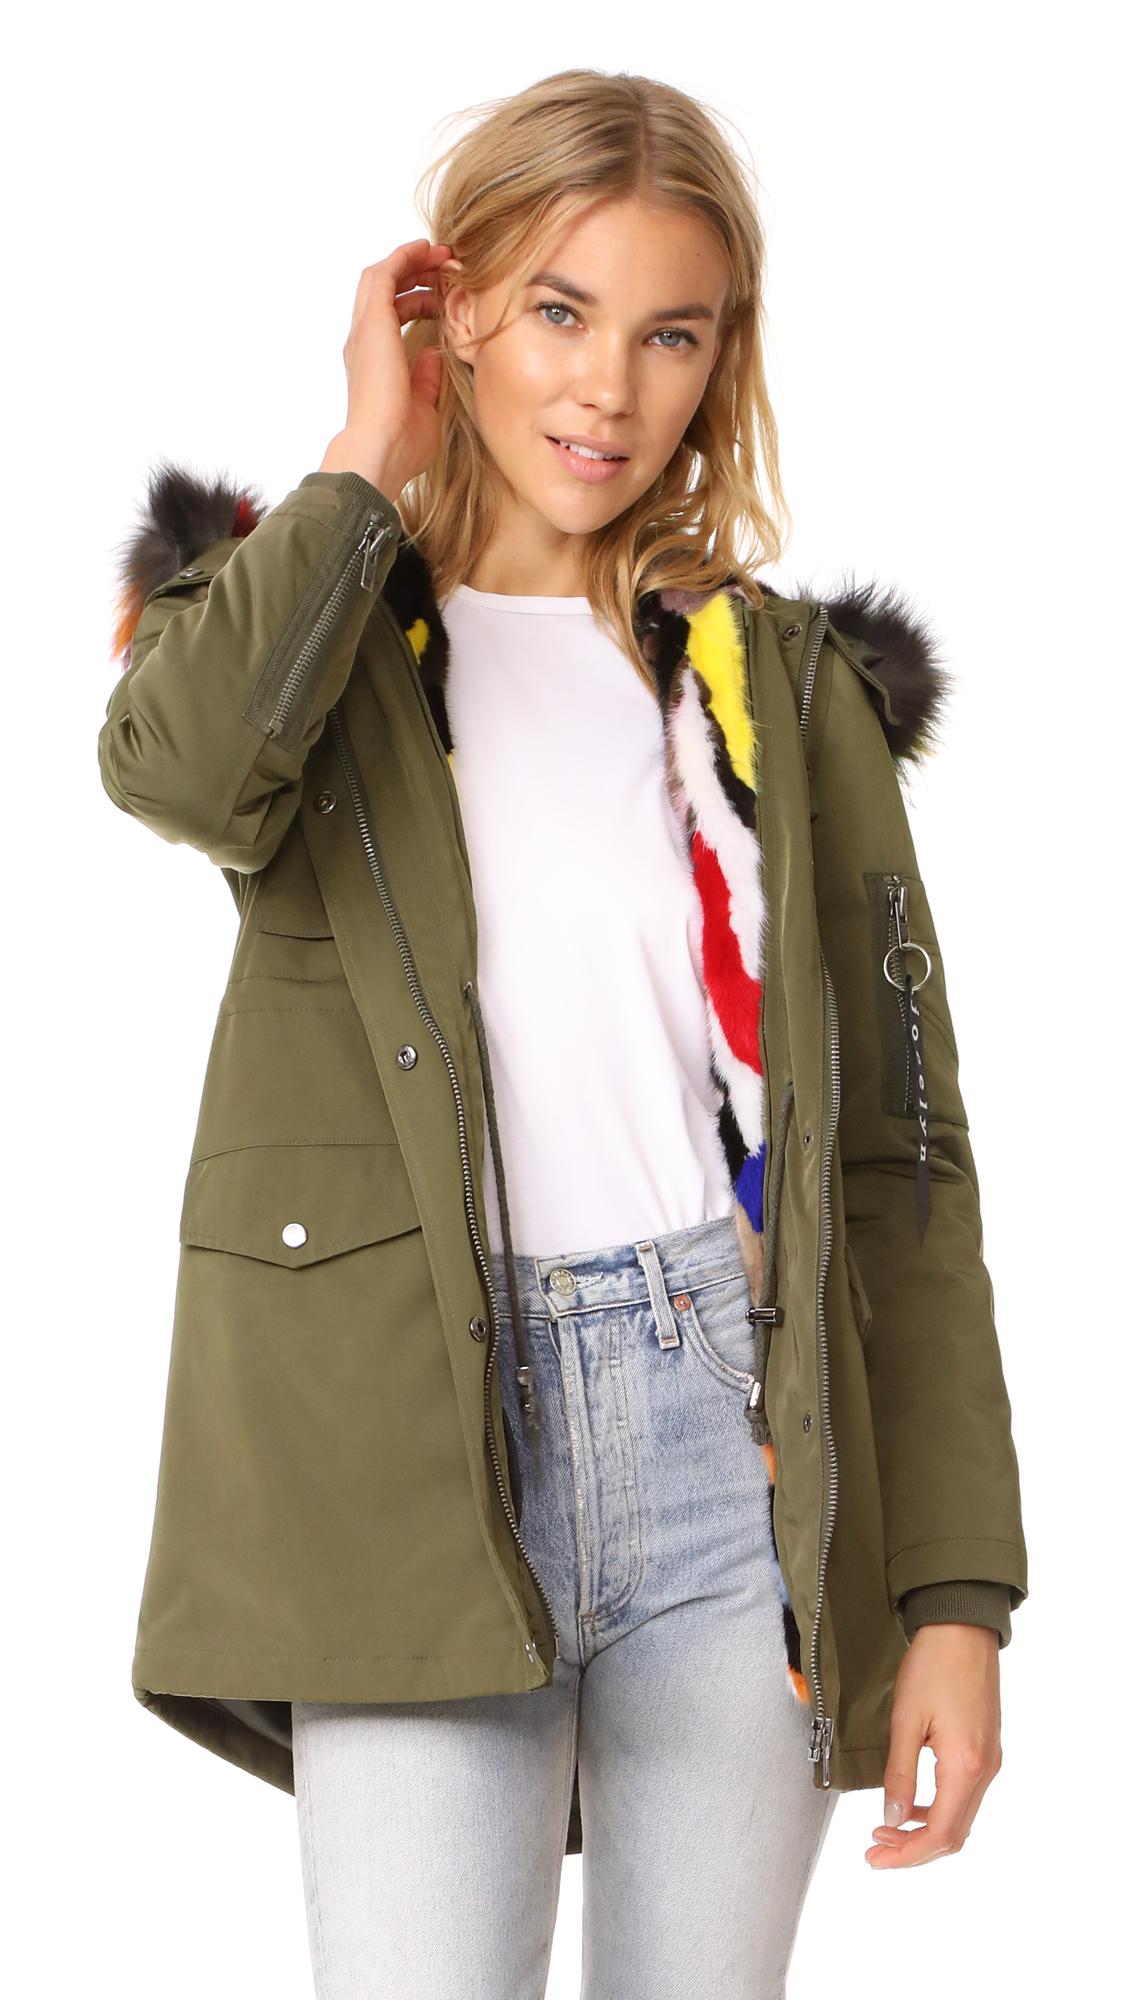 Jocelyn Cargo Coat With Mink Liner - Green/Bright Multi